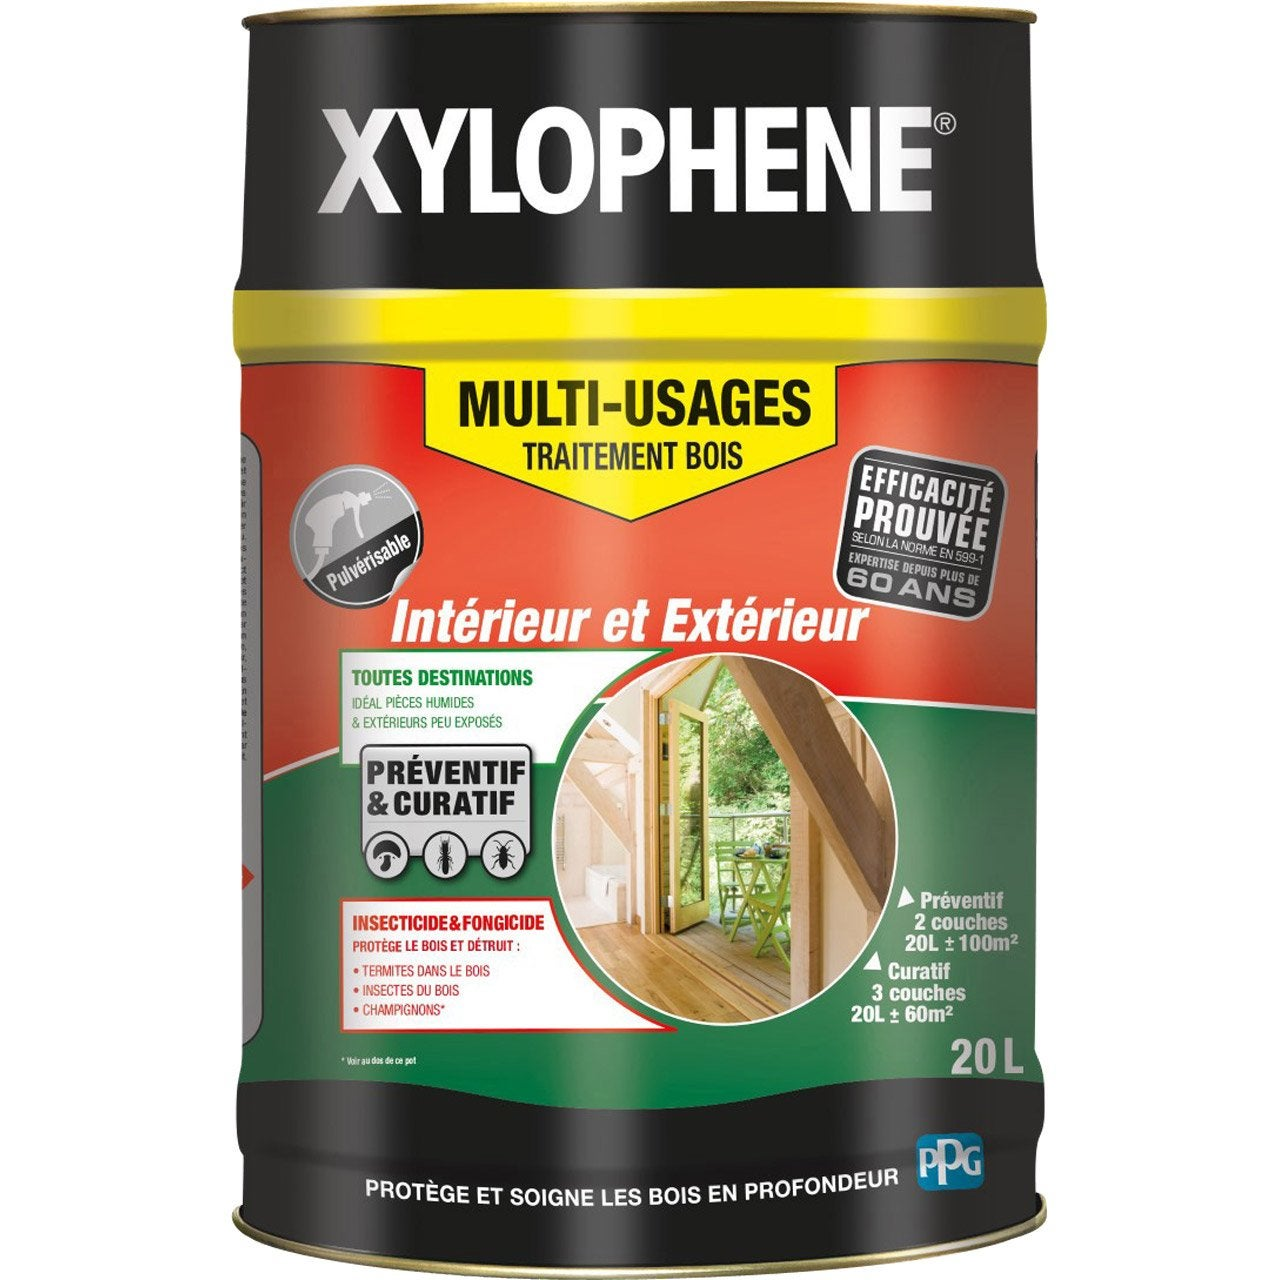 Trait multi usage xylophene 20l leroy merlin - Xylophene leroy merlin ...